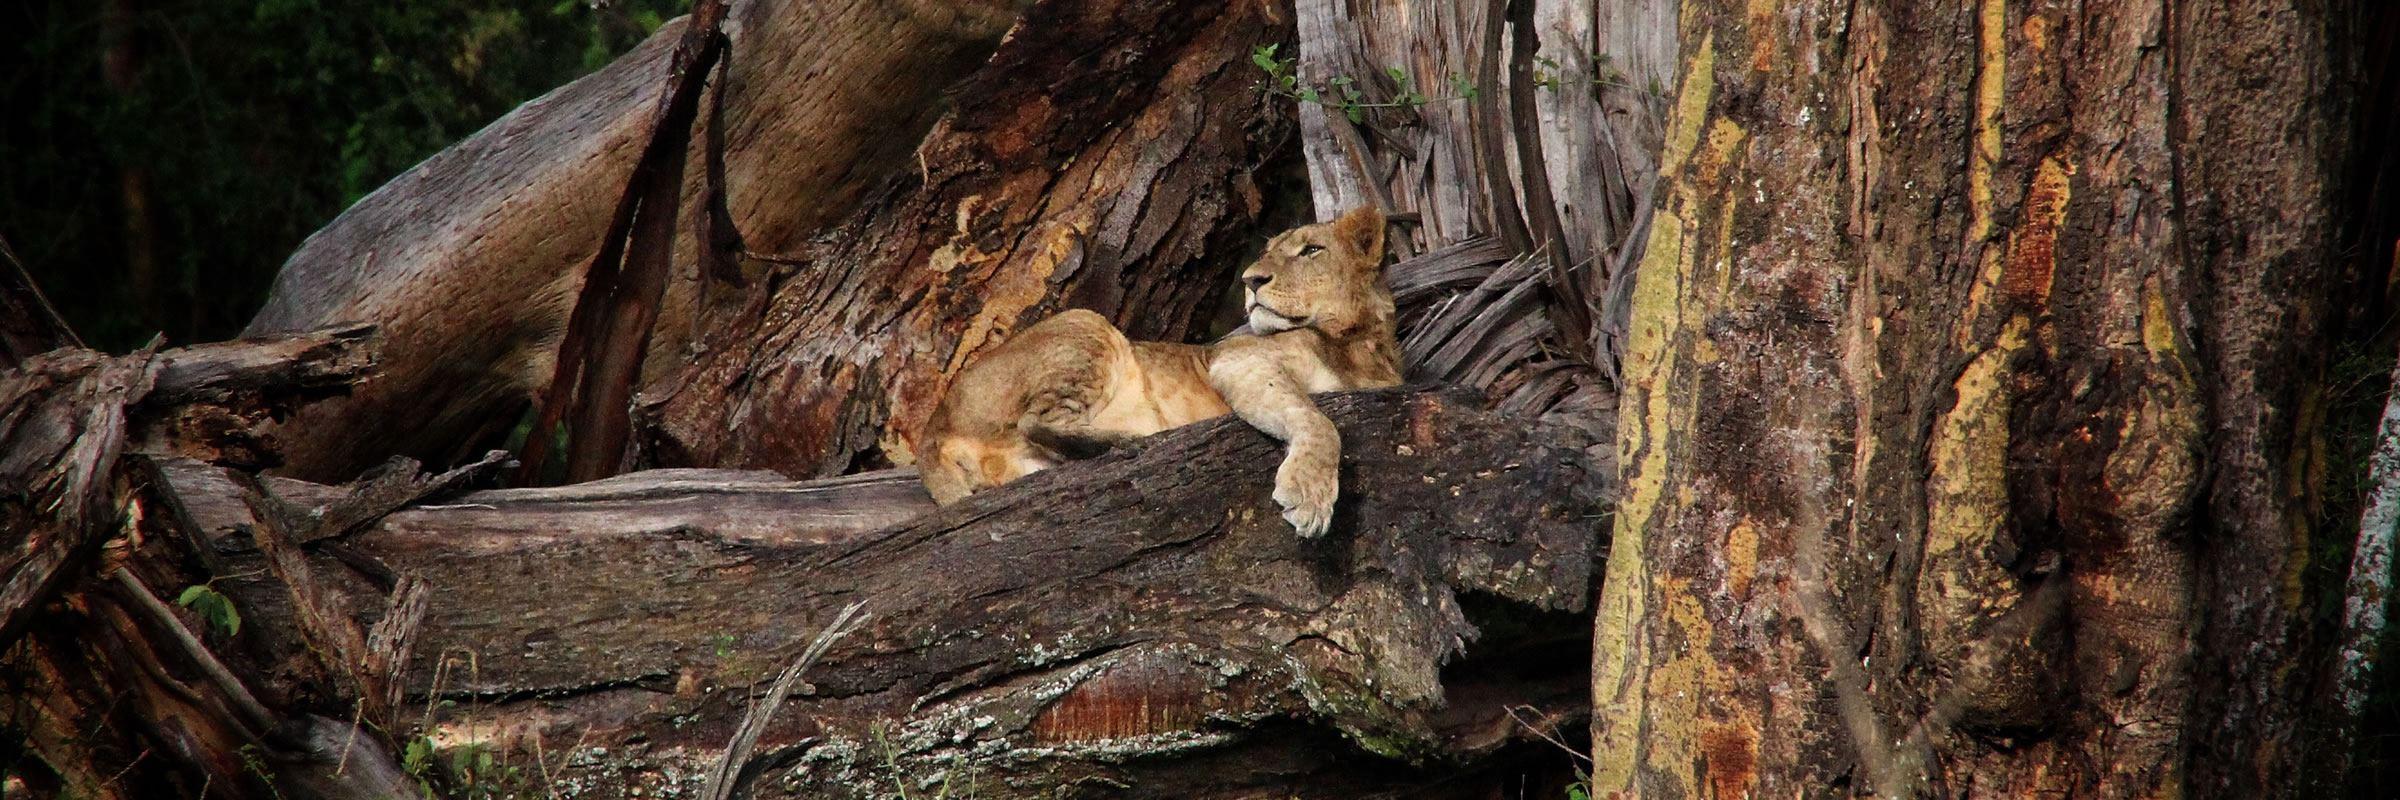 Lion in Lake Nakuru National Park, Kenya